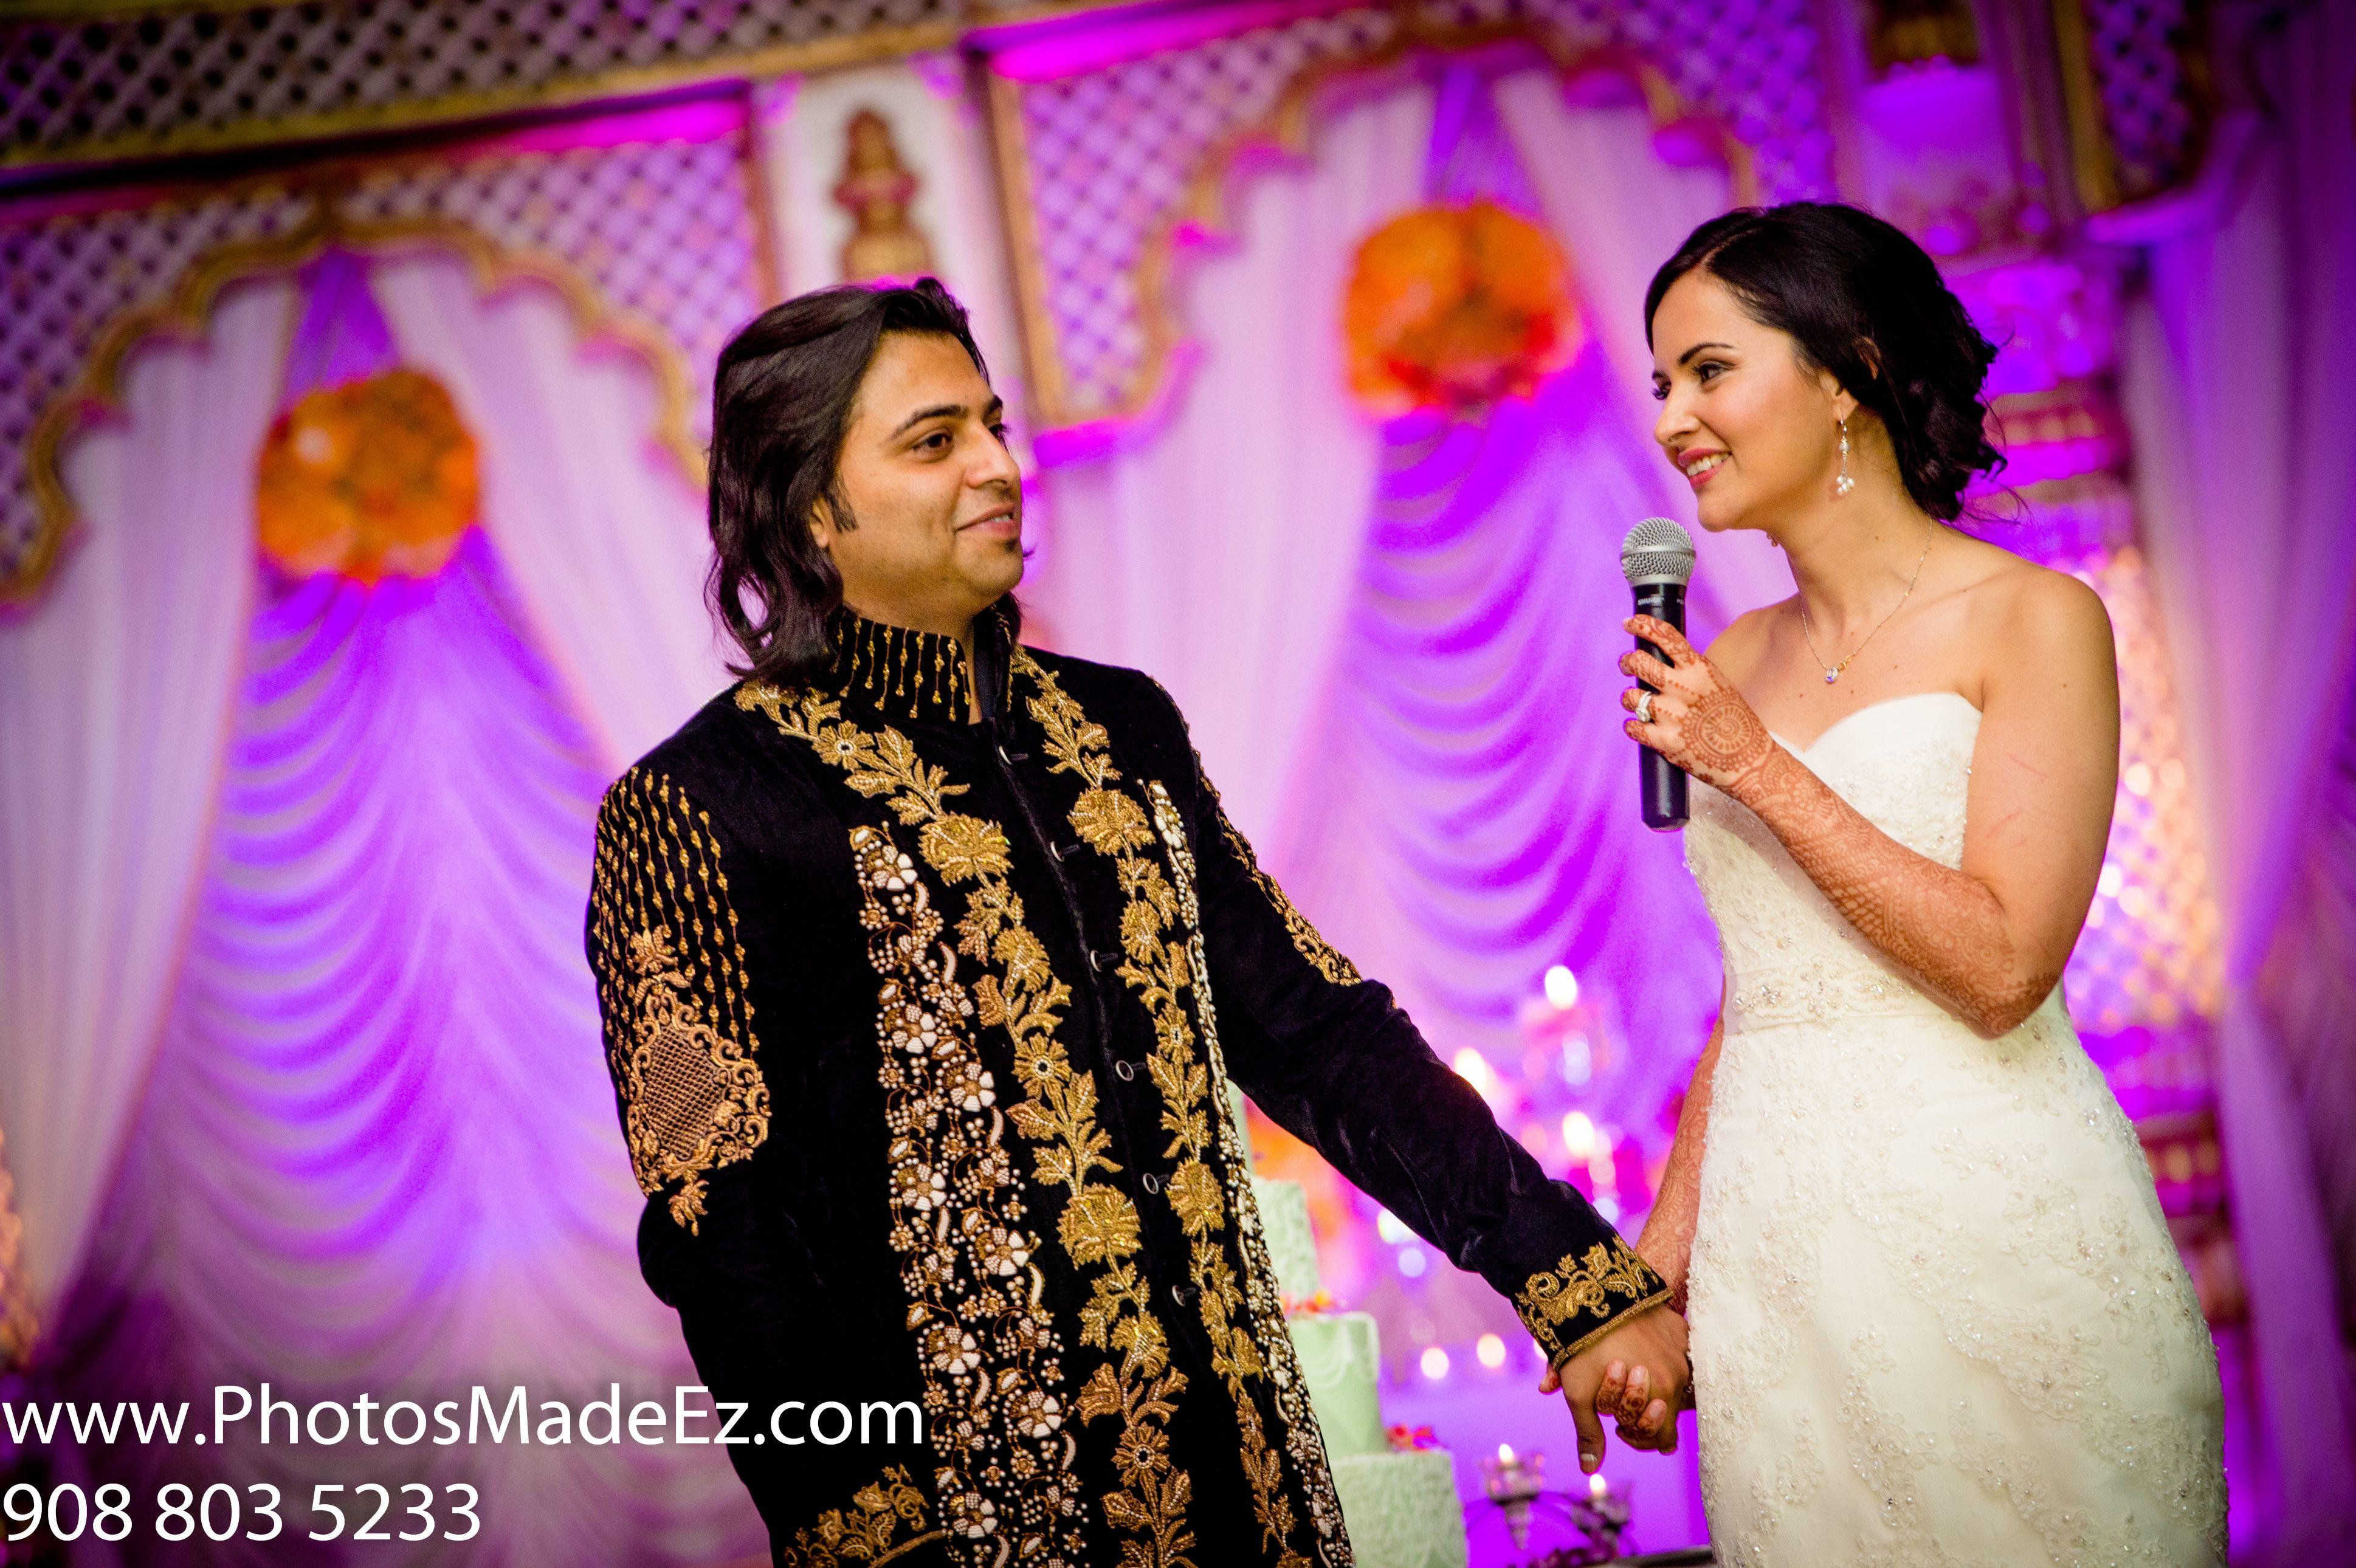 Wedding Reception Photo In Interfaith Wedding In Dovers Down Casino